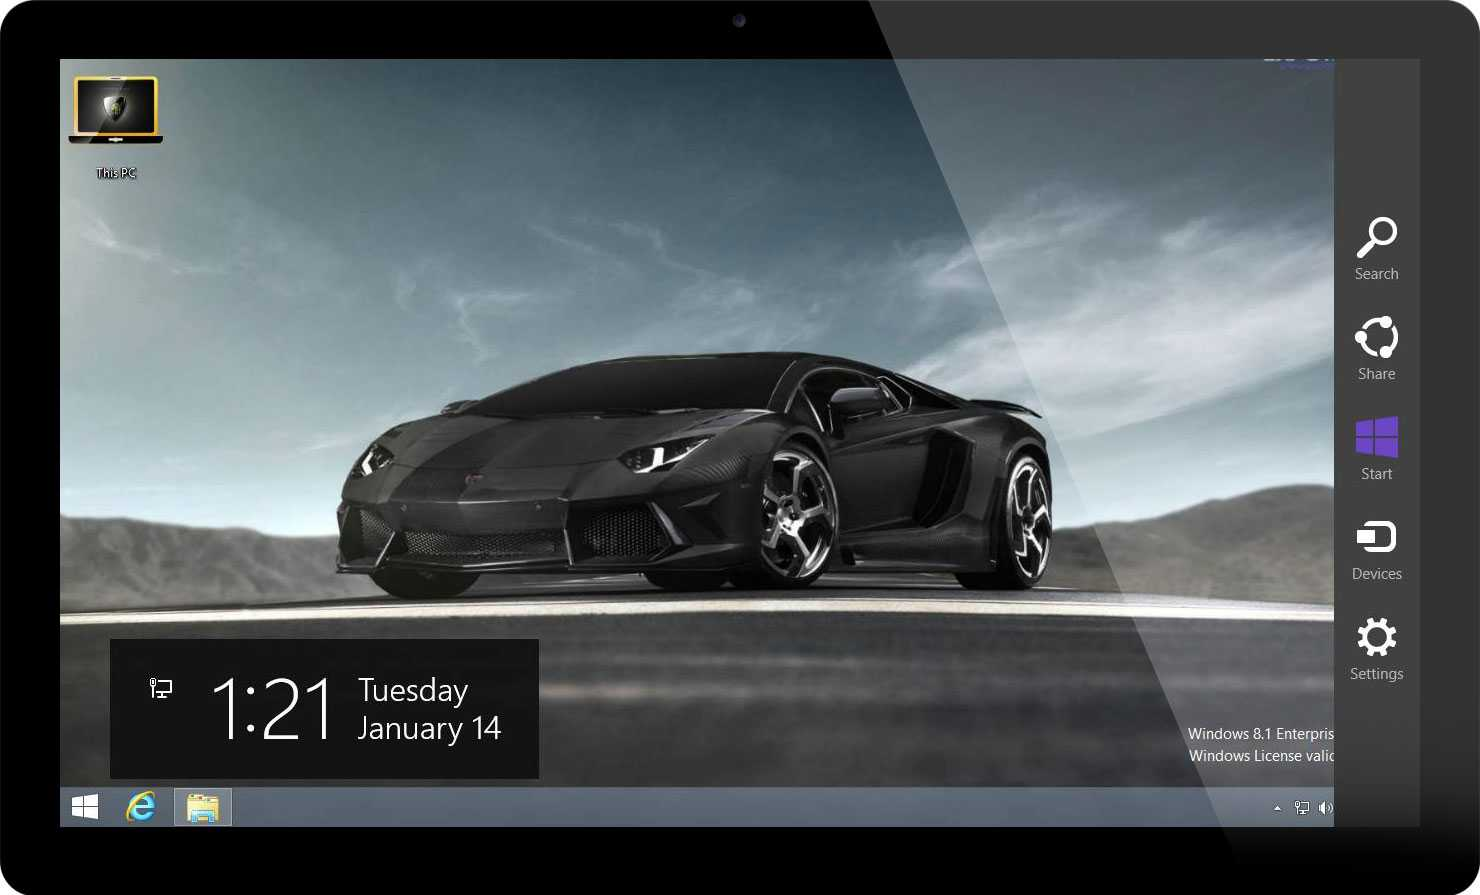 39 Car Wallpapers For Windows 10 On Wallpapersafari